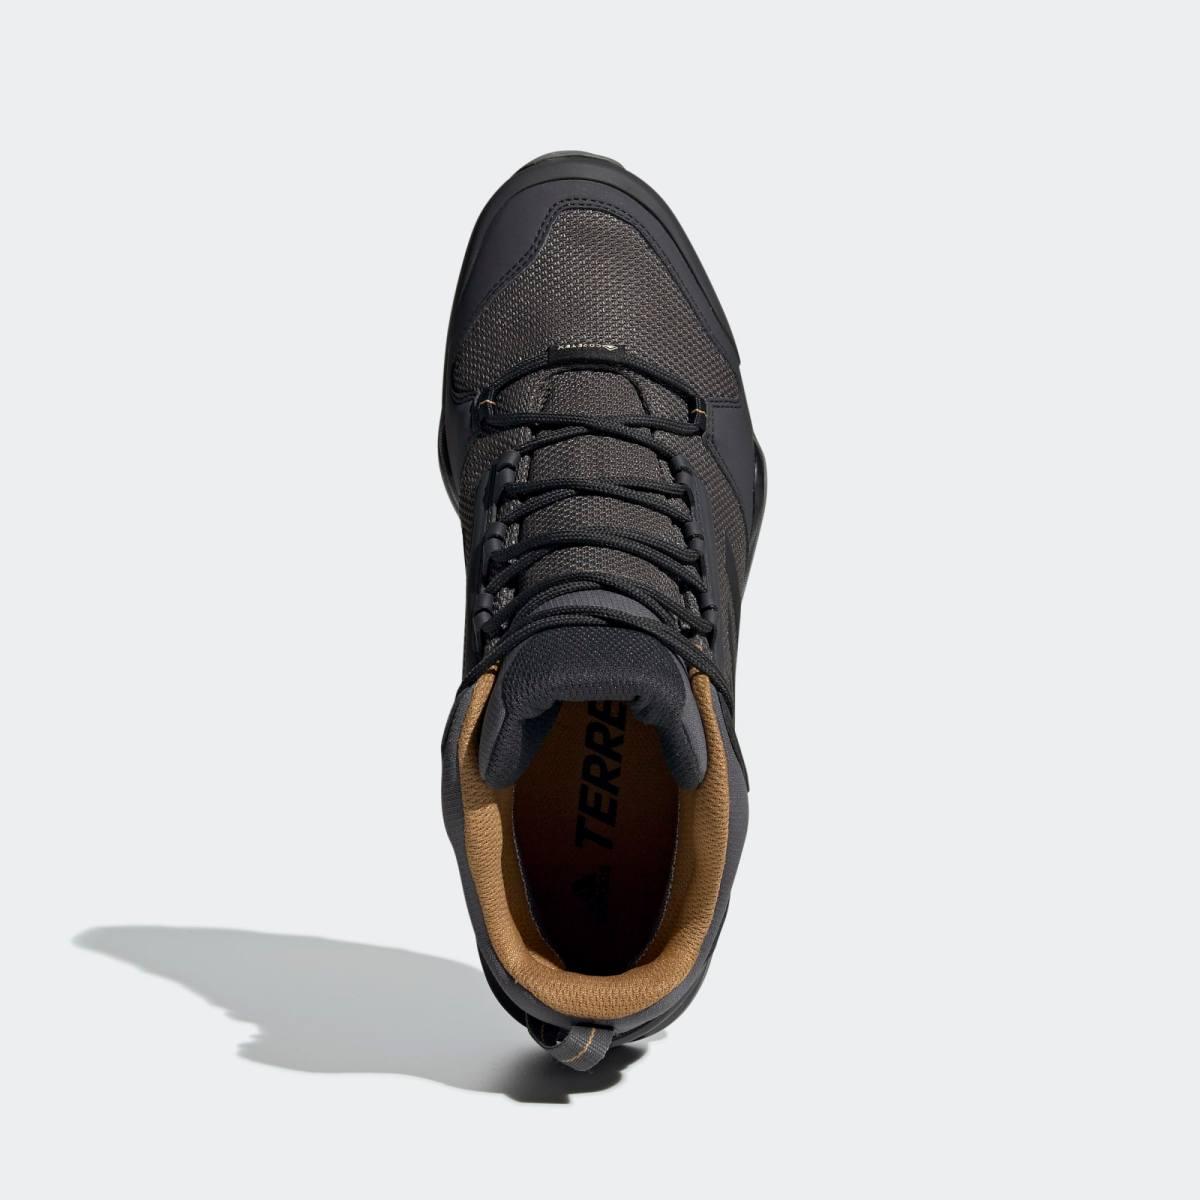 Chaussure_de_randonnee_Terrex_AX3_Mid_GORE-TEX_Gris_BC0468_02_standard